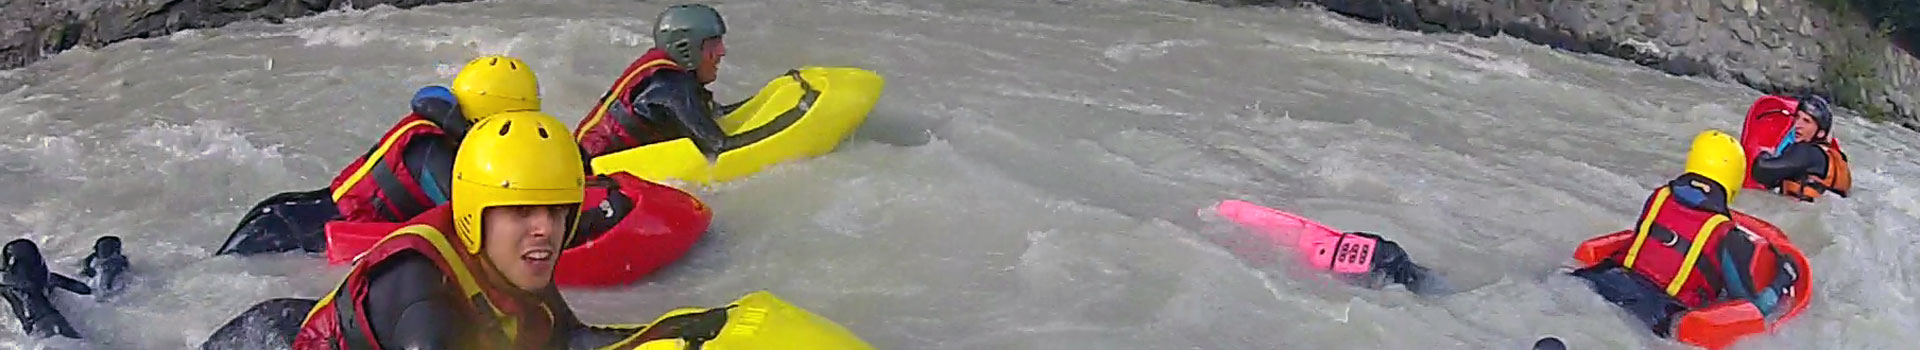 Hydrospeed fiume Dora Baltea